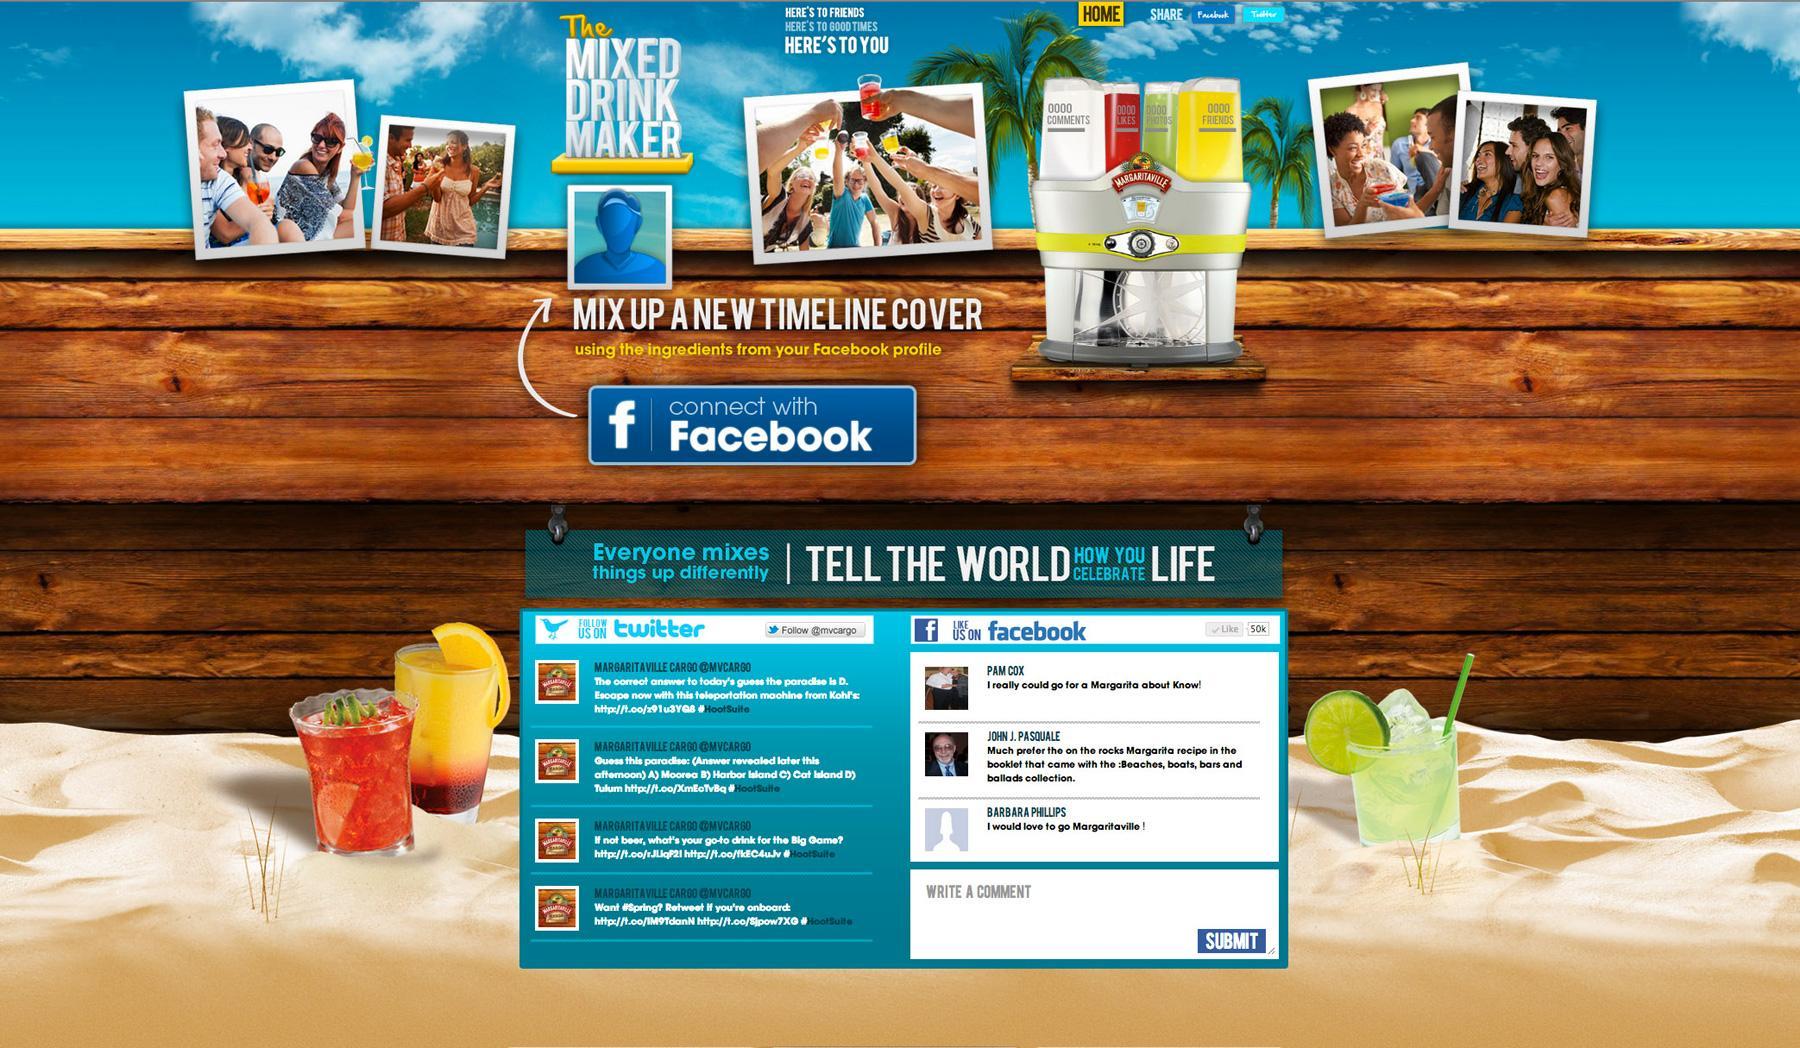 Margaritaville Digital Ad -  The Mixed Drink Maker